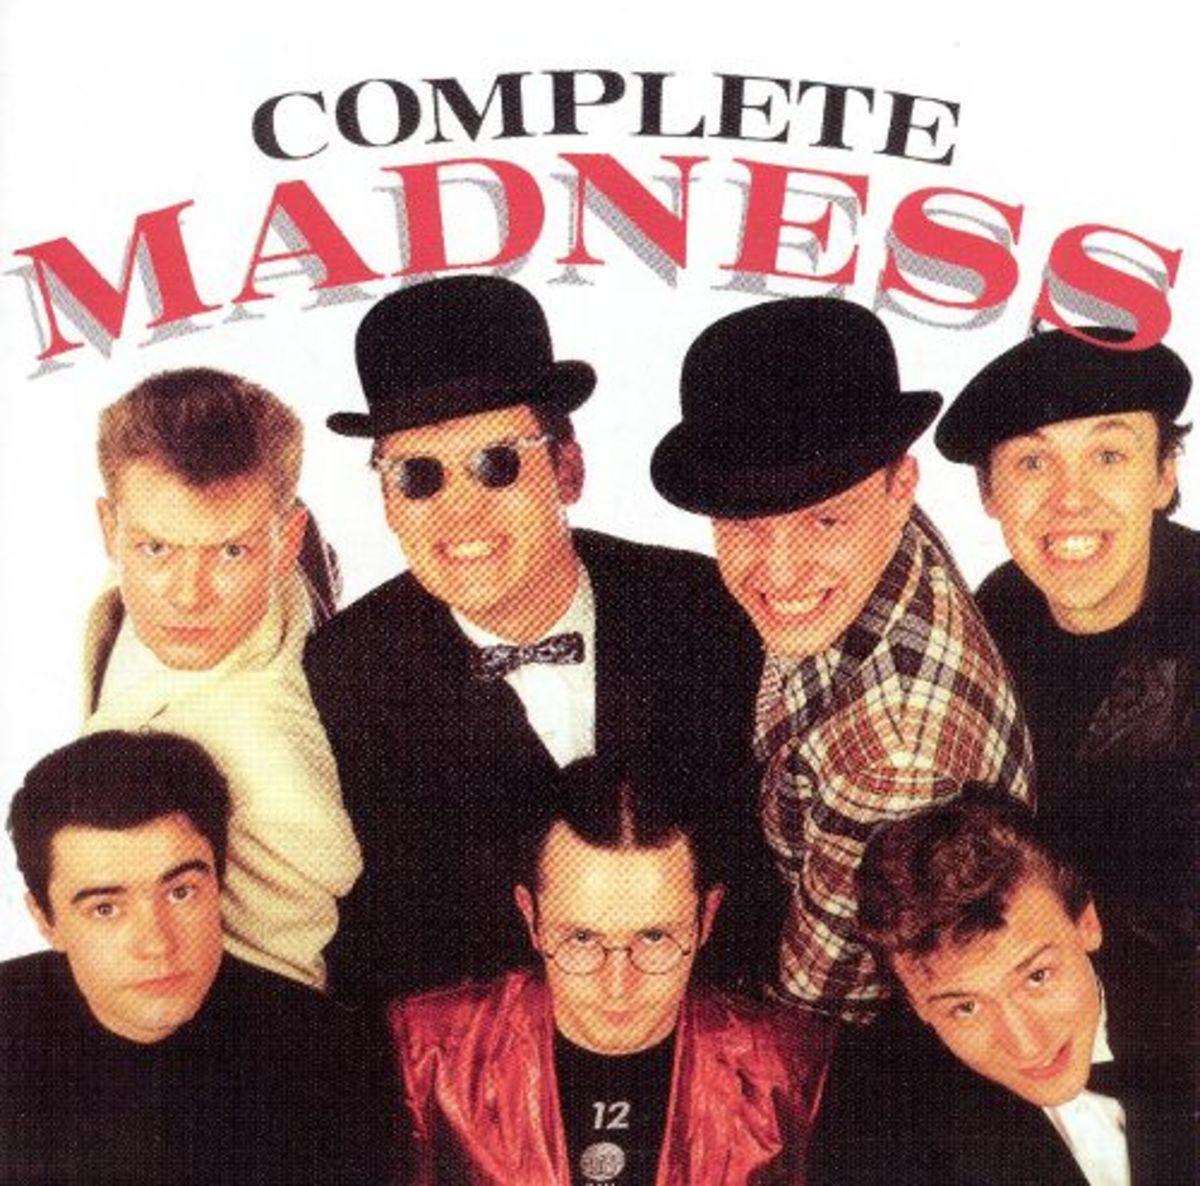 The Total Madness Album Contains Some Gems